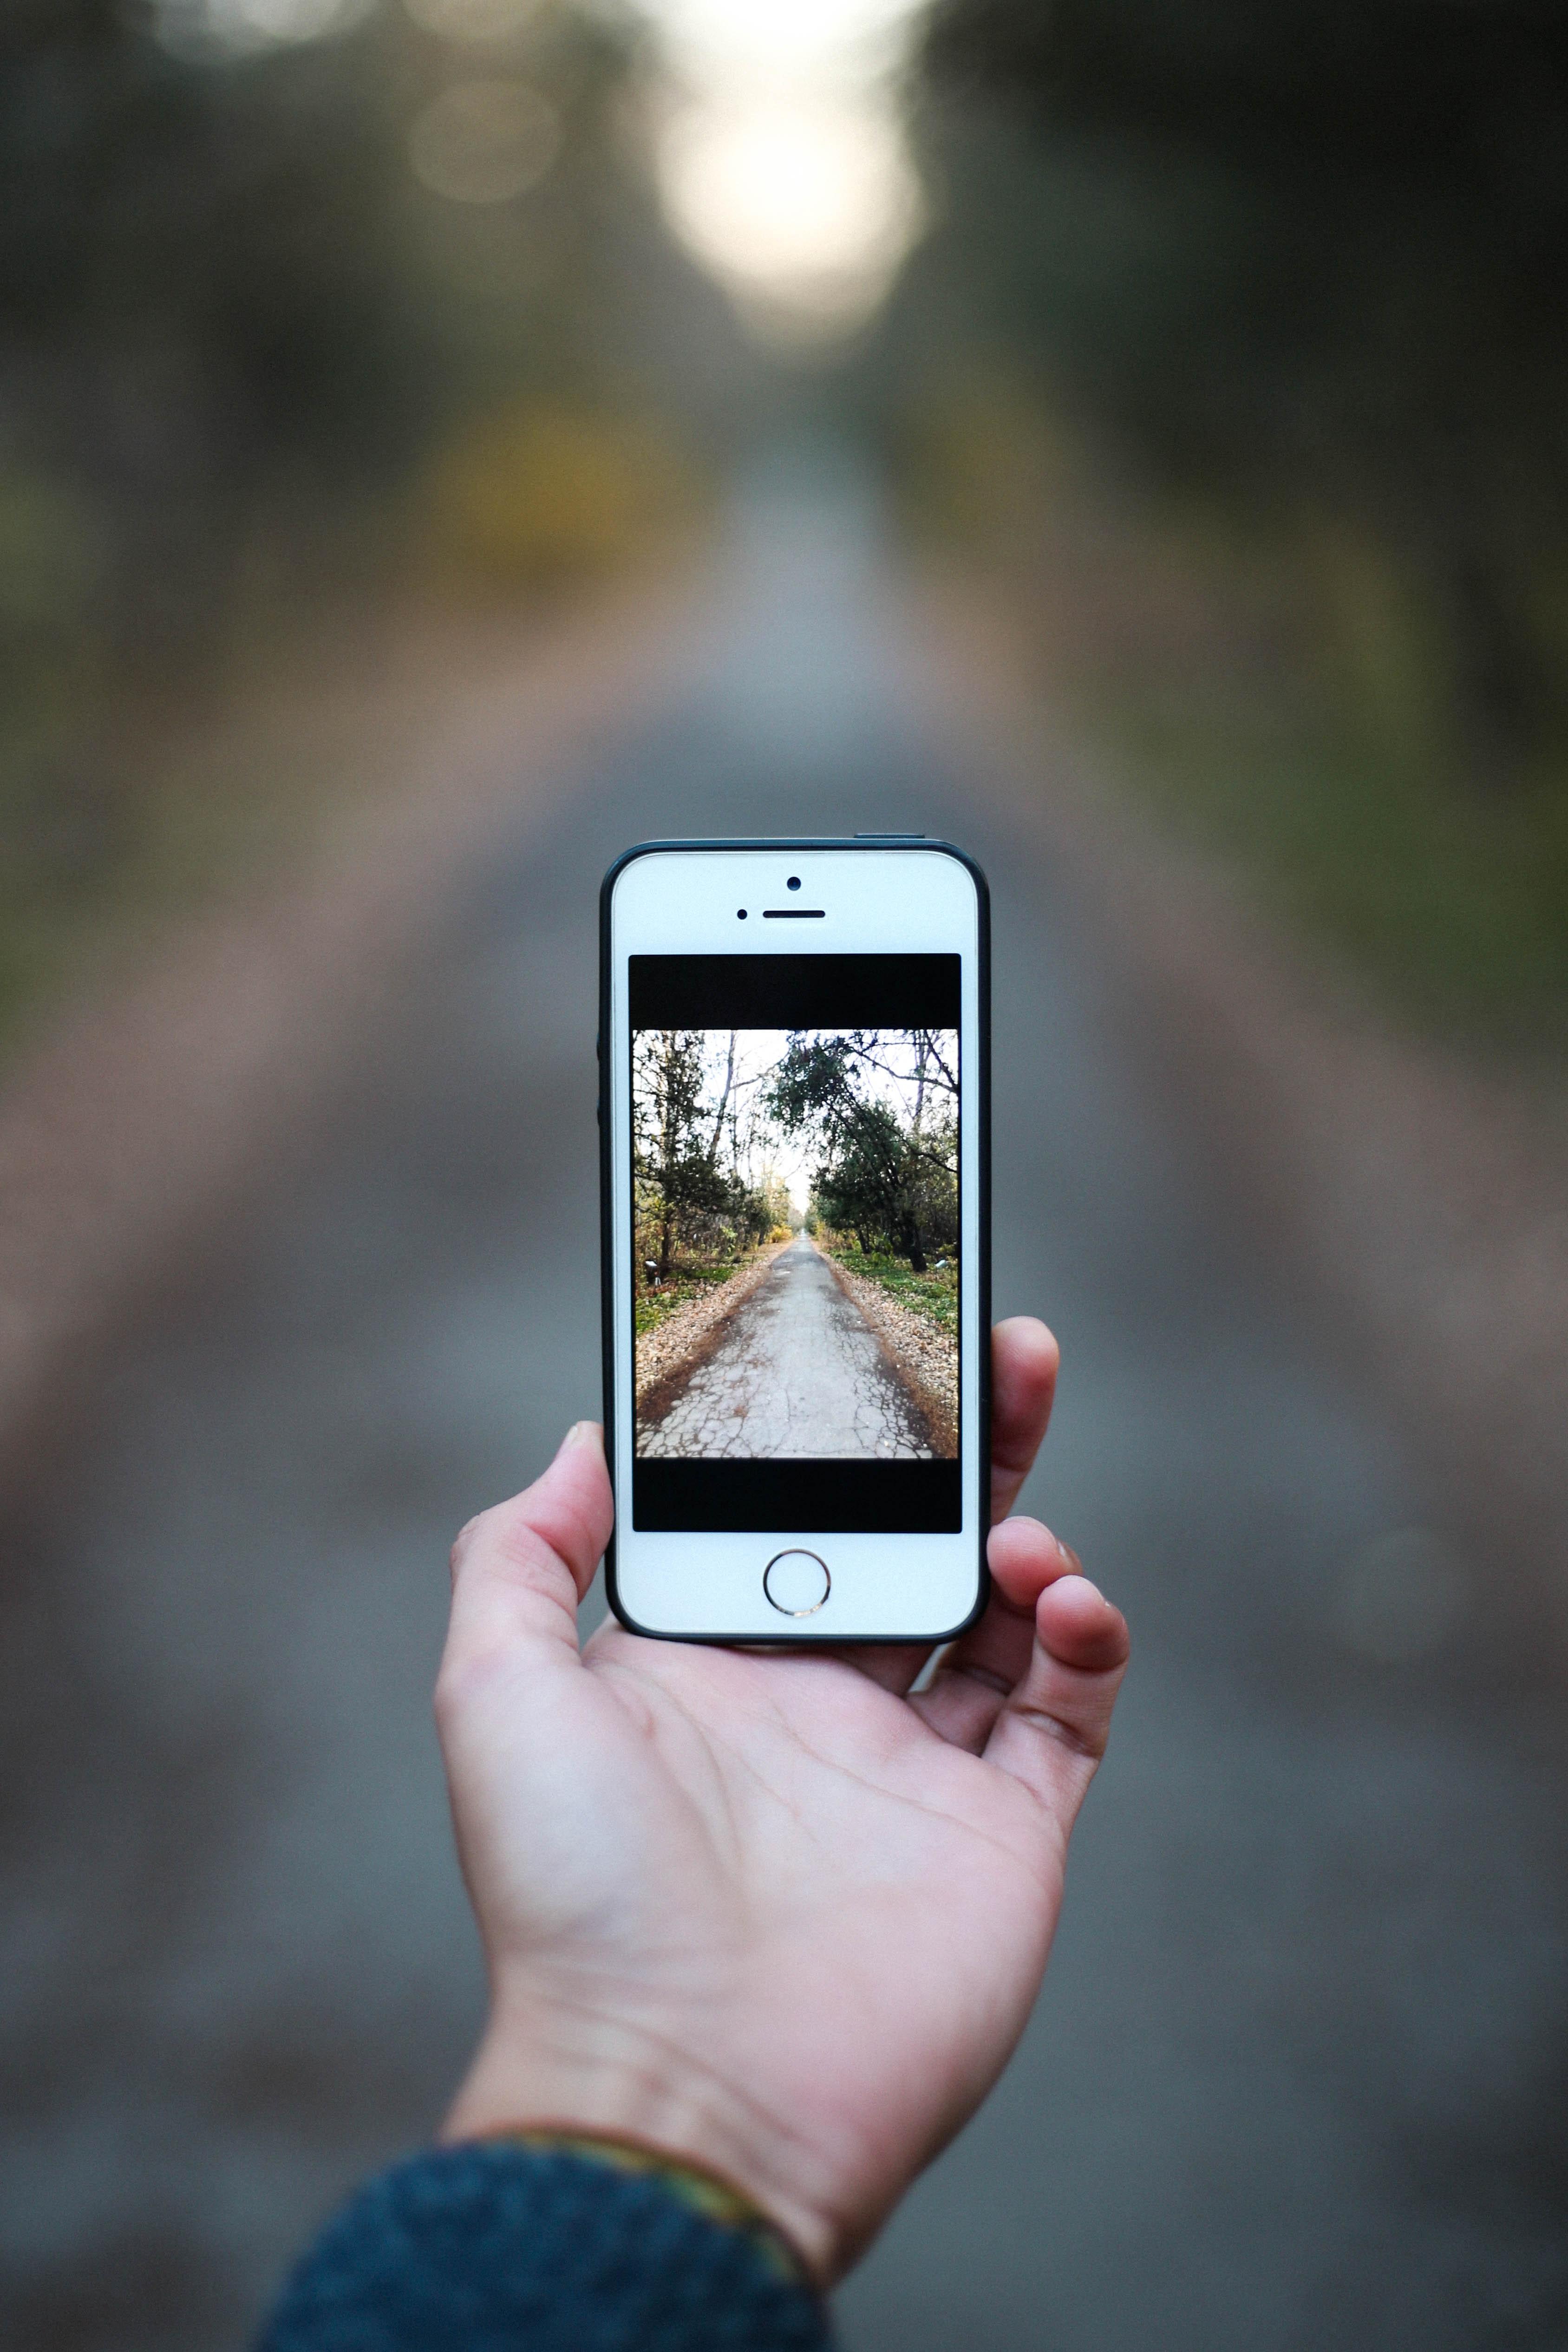 White Iphone 6 With Black Case, Blur, Screen, Modern, Multimedia, HQ Photo